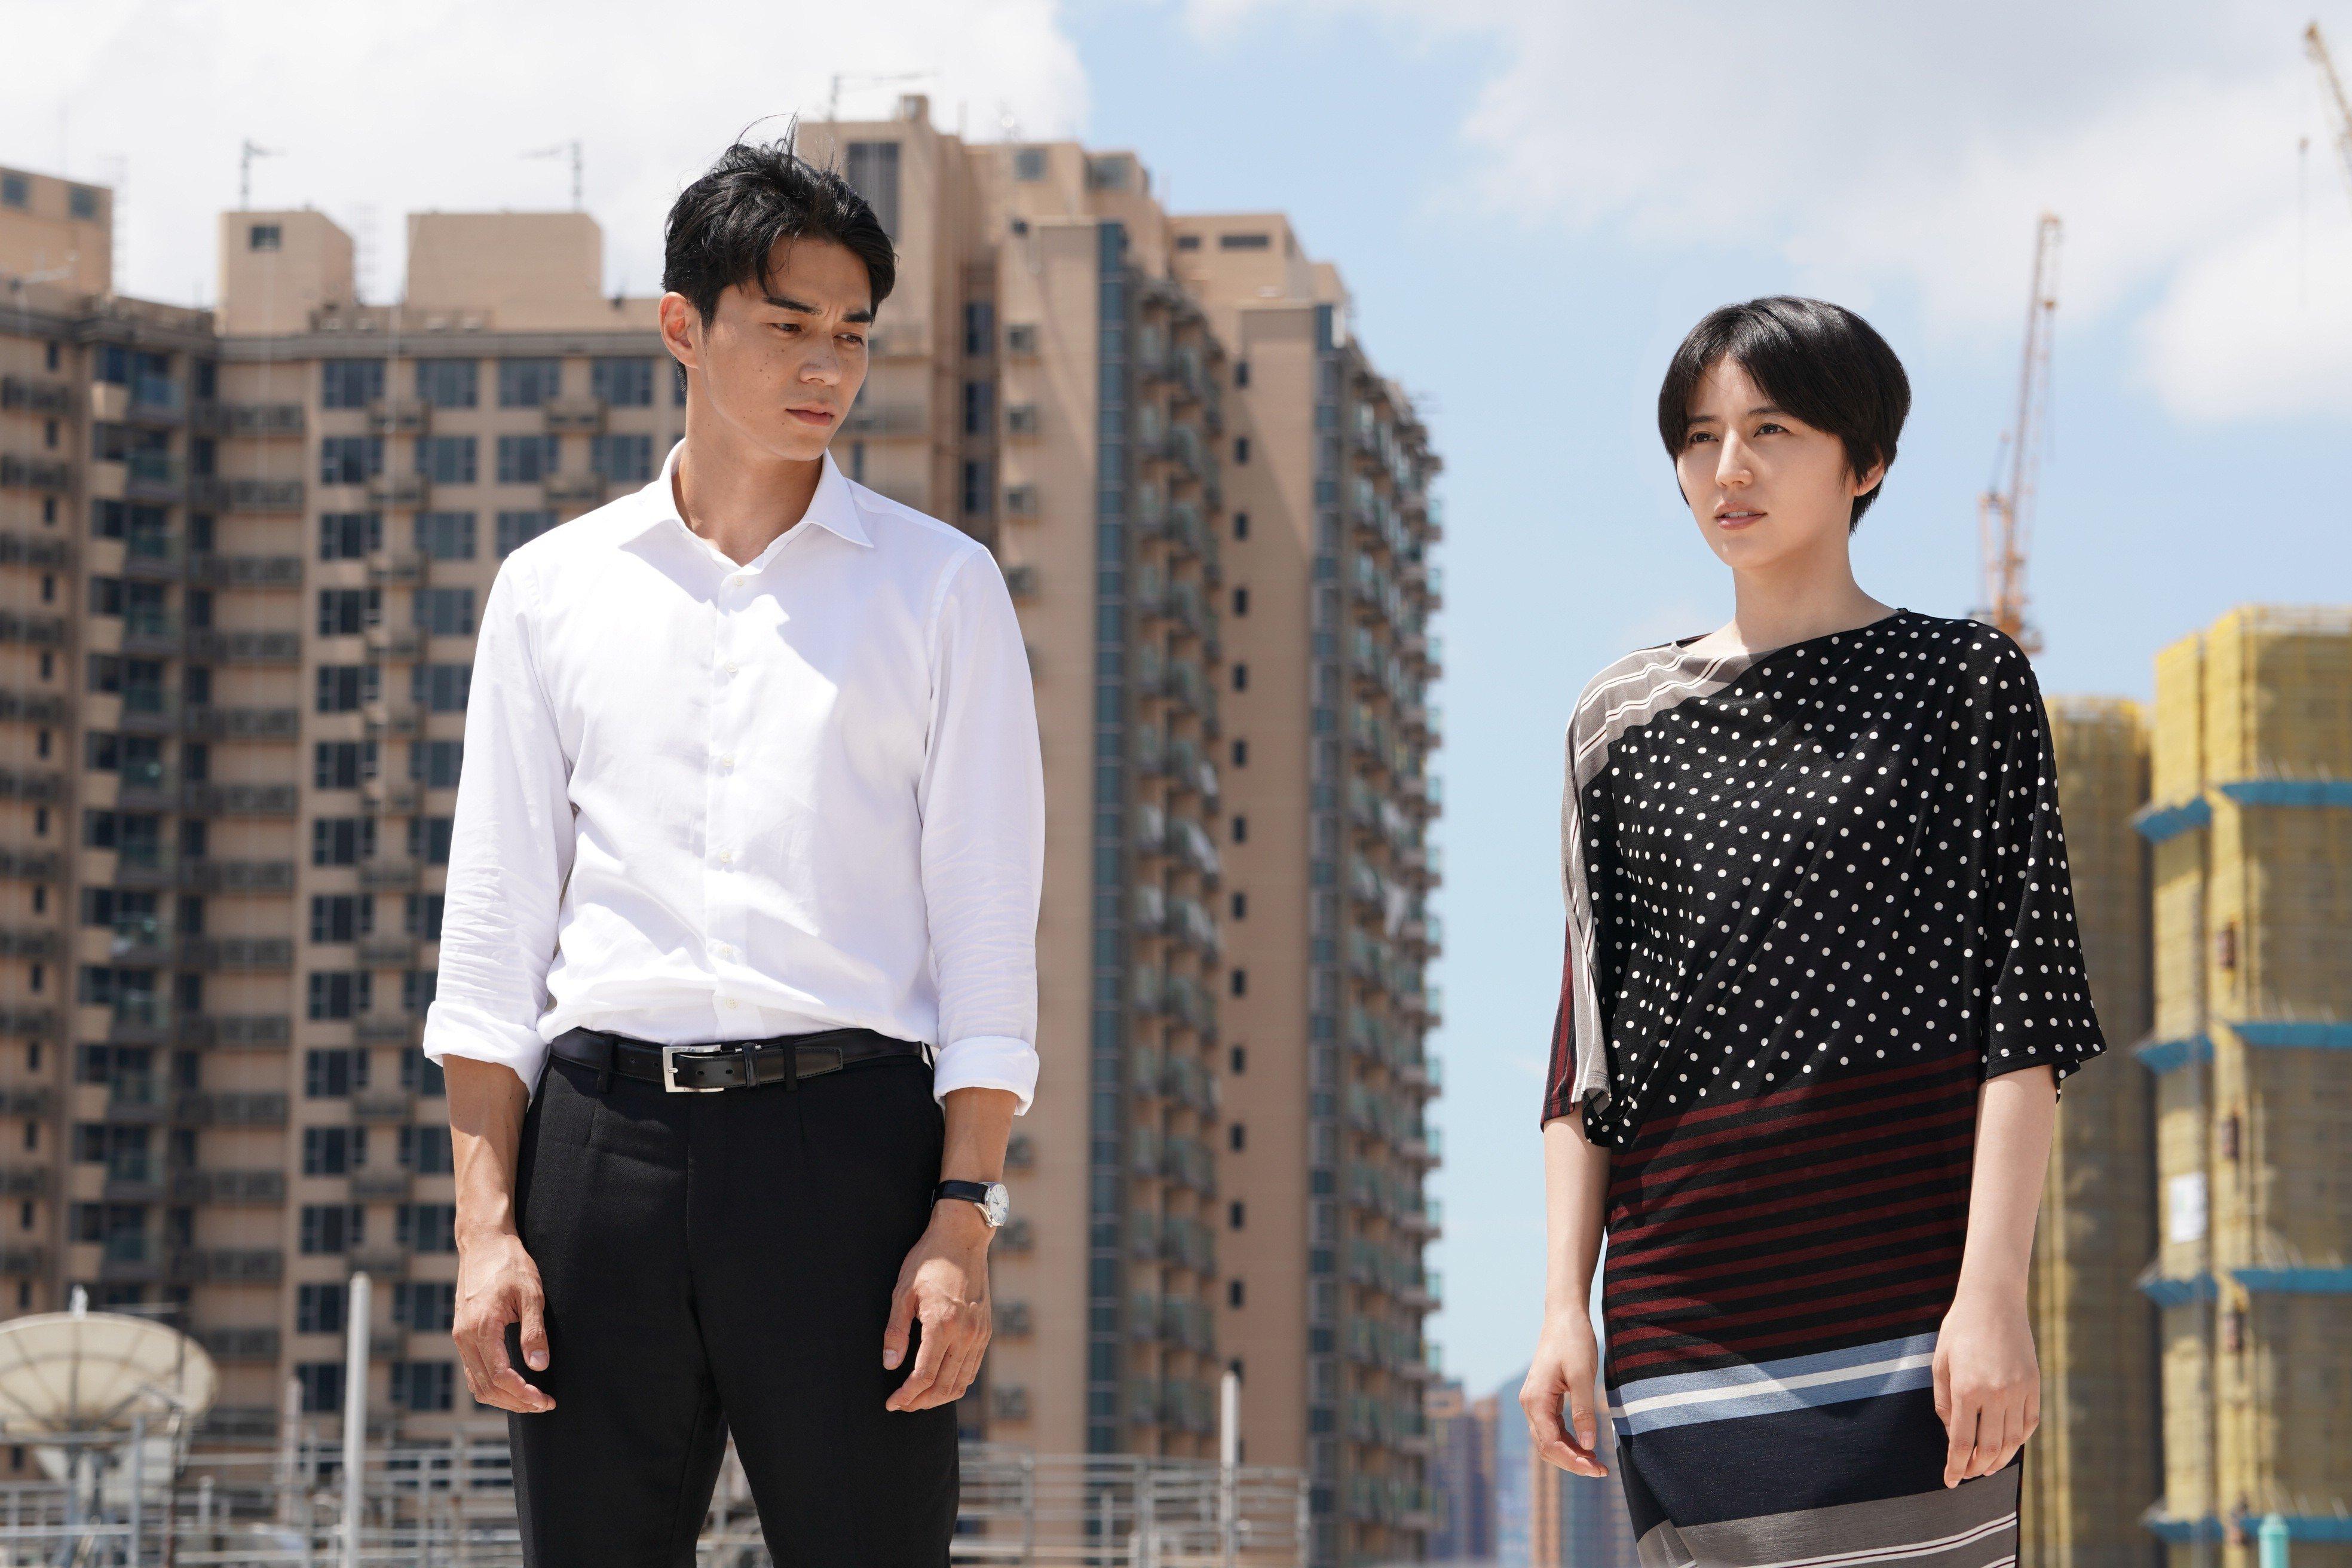 The Confidence Man JP film review: Hong Kong-set Japanese TV